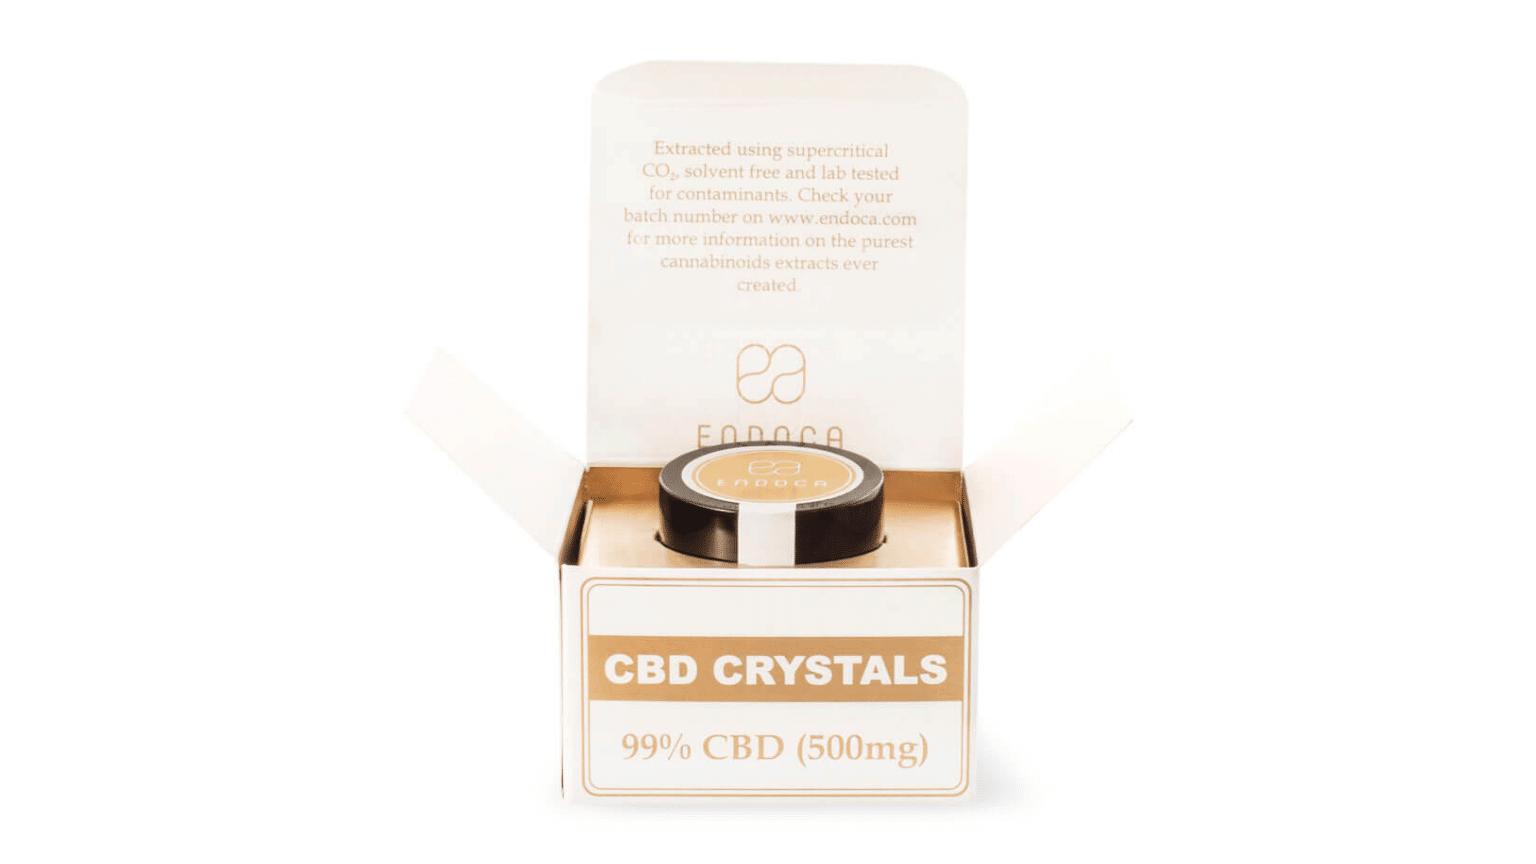 endoca-crystals-cbd-isolate